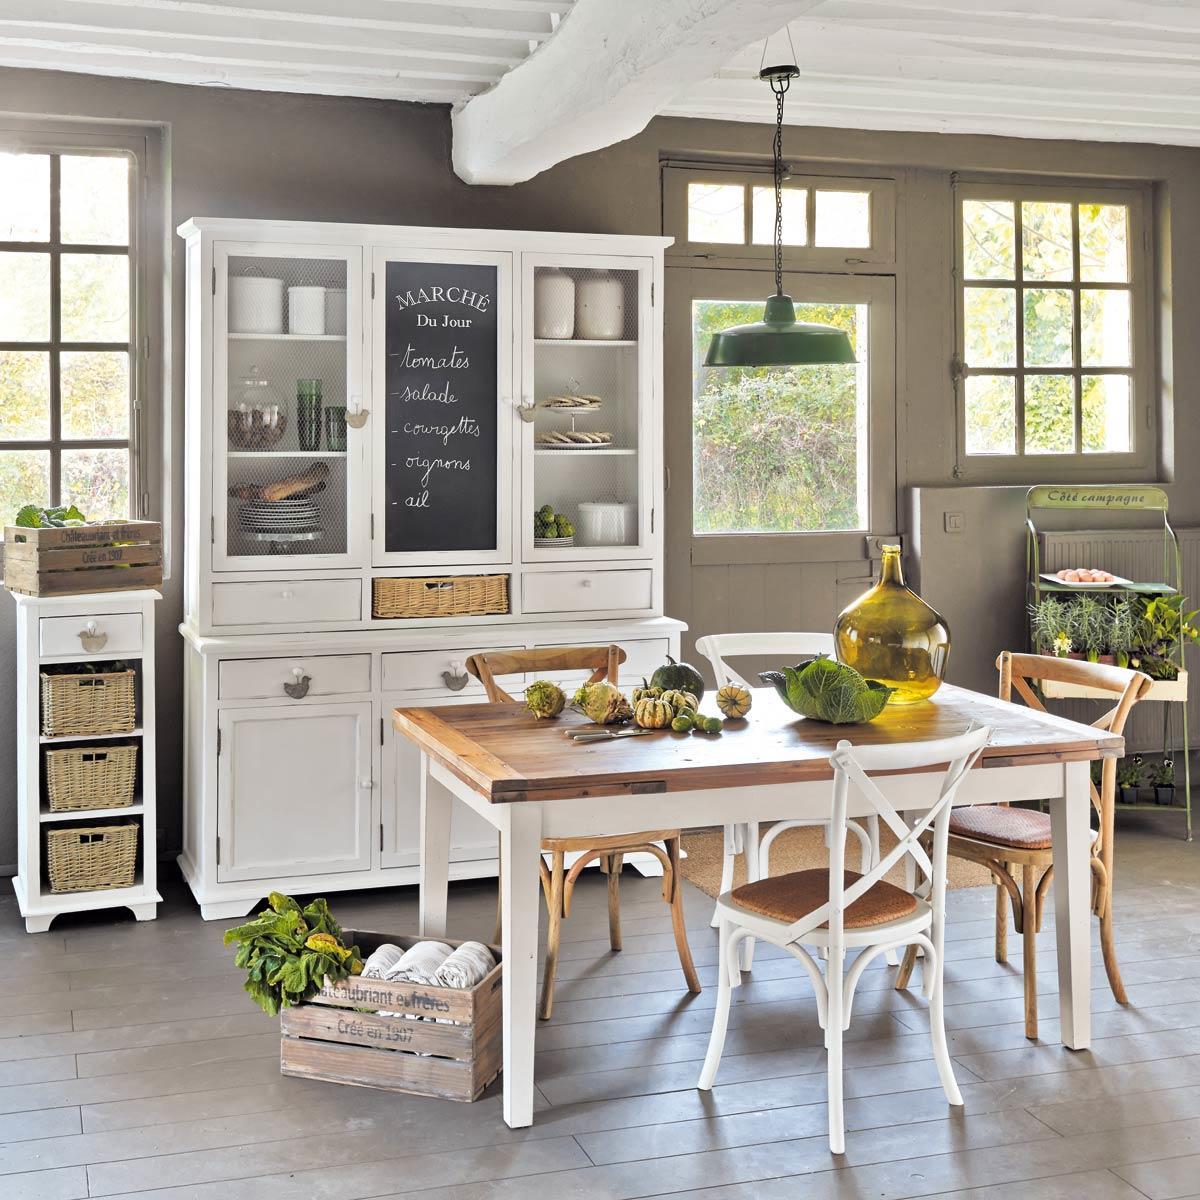 Maison Du Monde Tavoli Da Cucina.Cucine Maison Du Monde Accessori E Mobili In Stile Shabby Foto